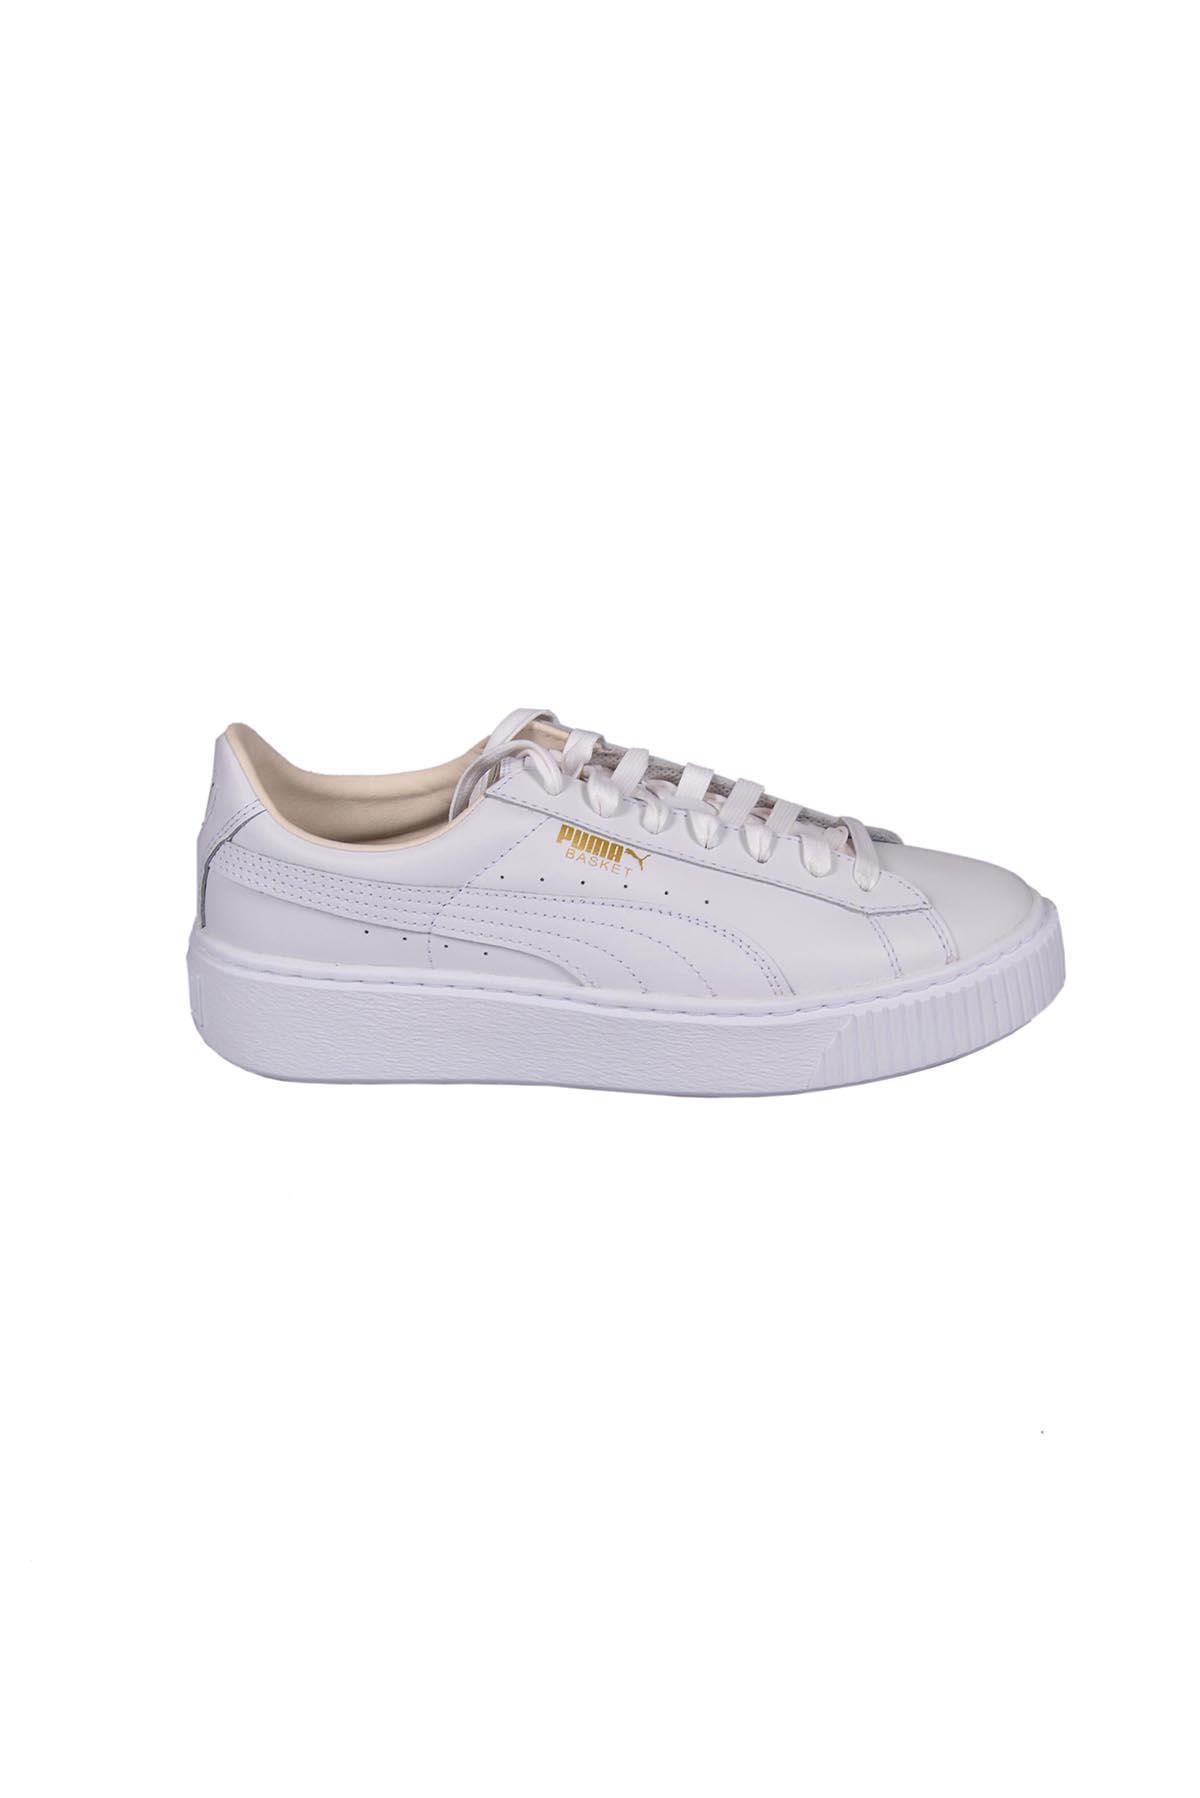 Puma Basket Platform Core Sneakers In White